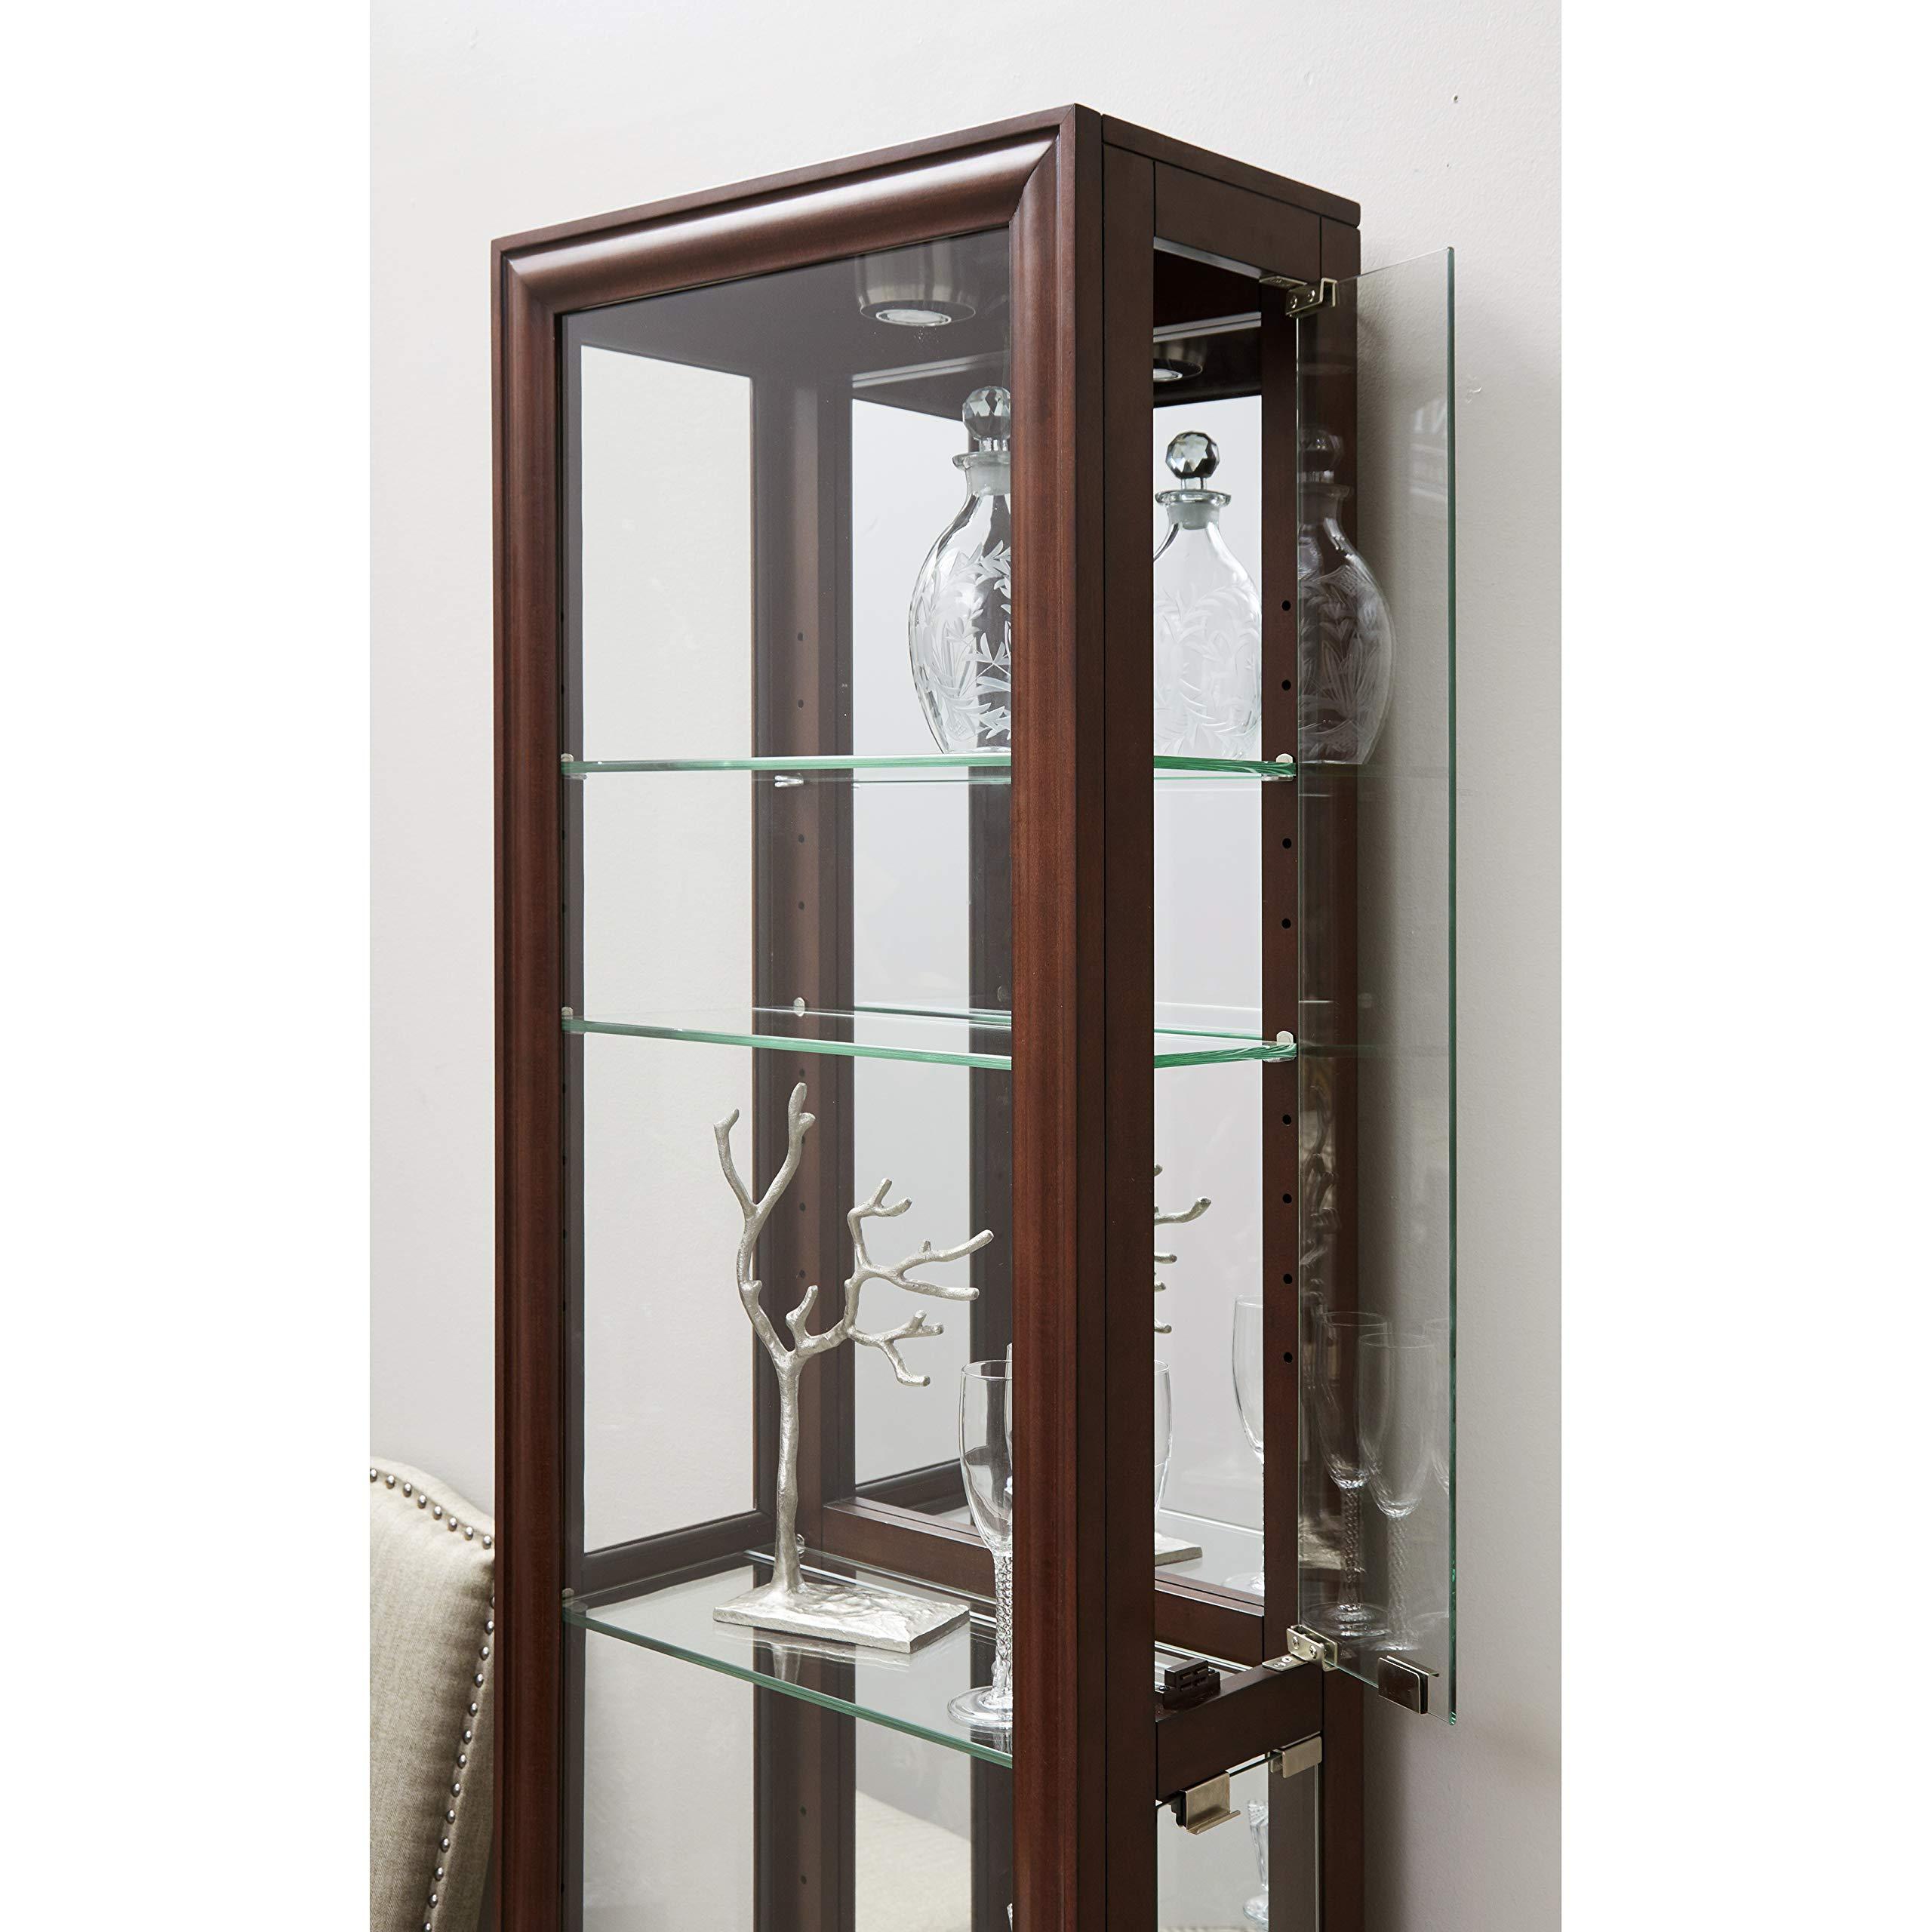 Pulaski  Side Entry Curio Display Cabinet, 21.0'' L x 11.0'' W x 77.0'' H, Cherry by Pulaski (Image #6)